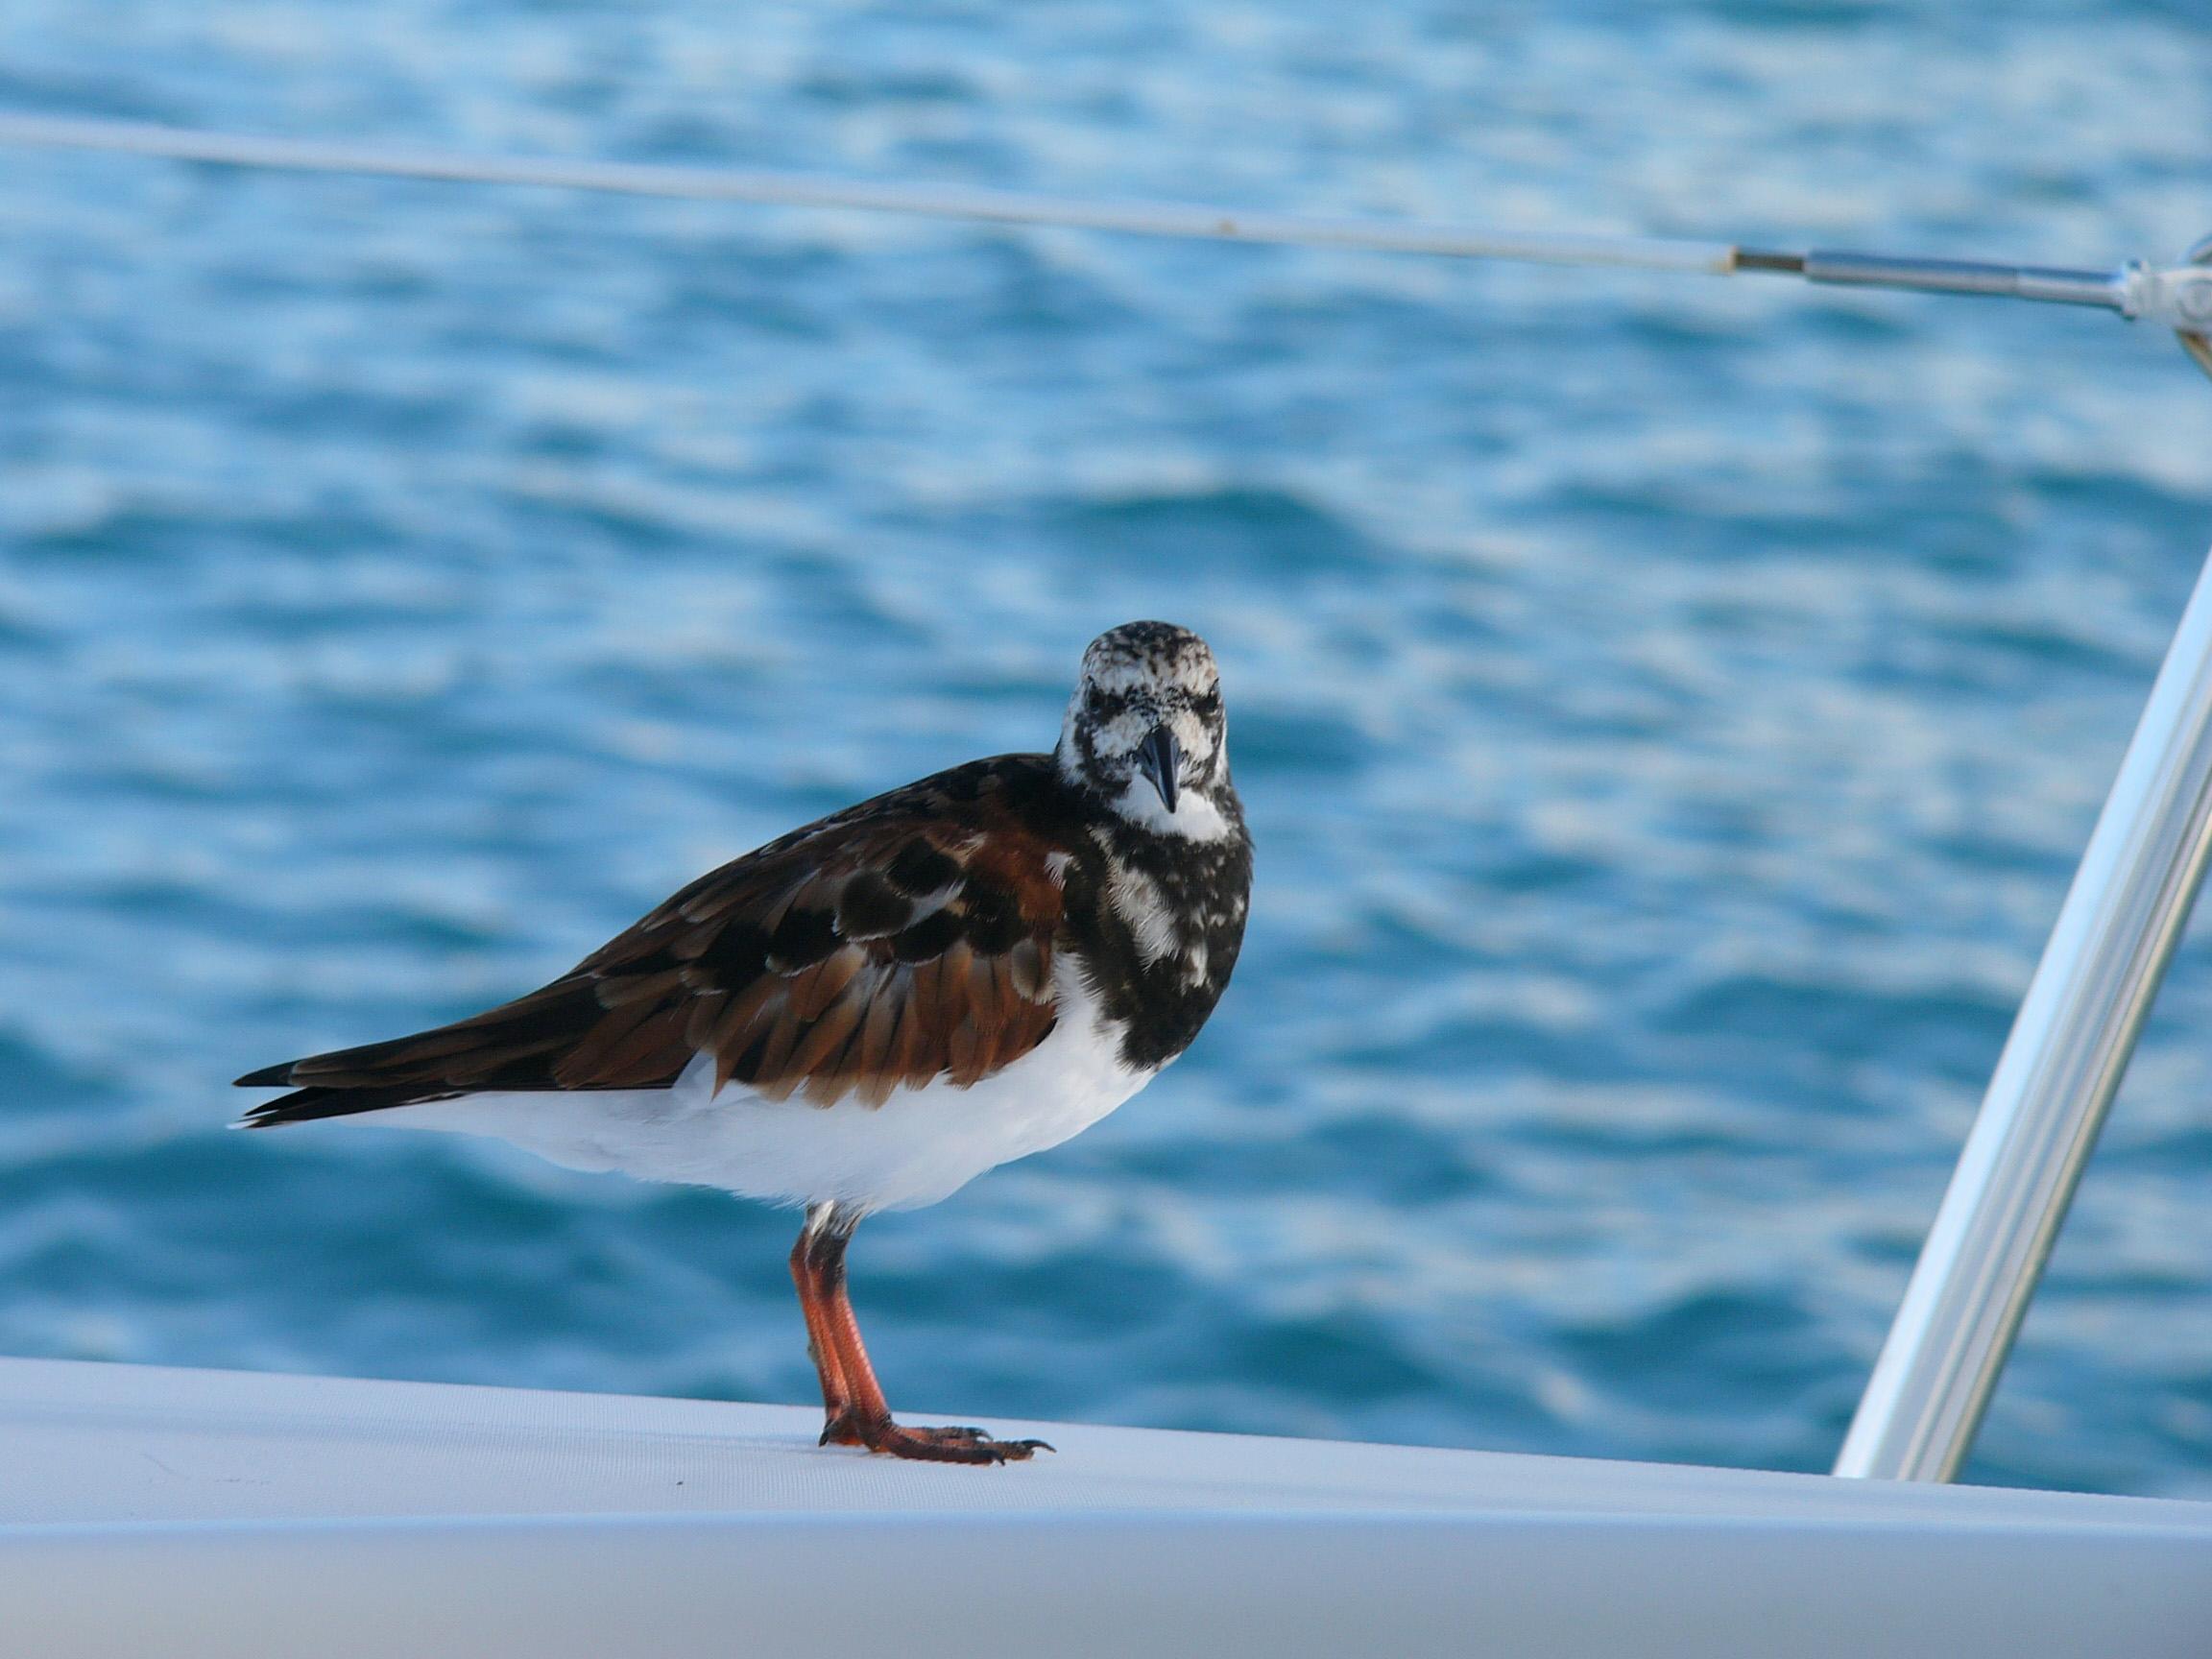 Interpres anegada british virgin islands perching on a boat 8c